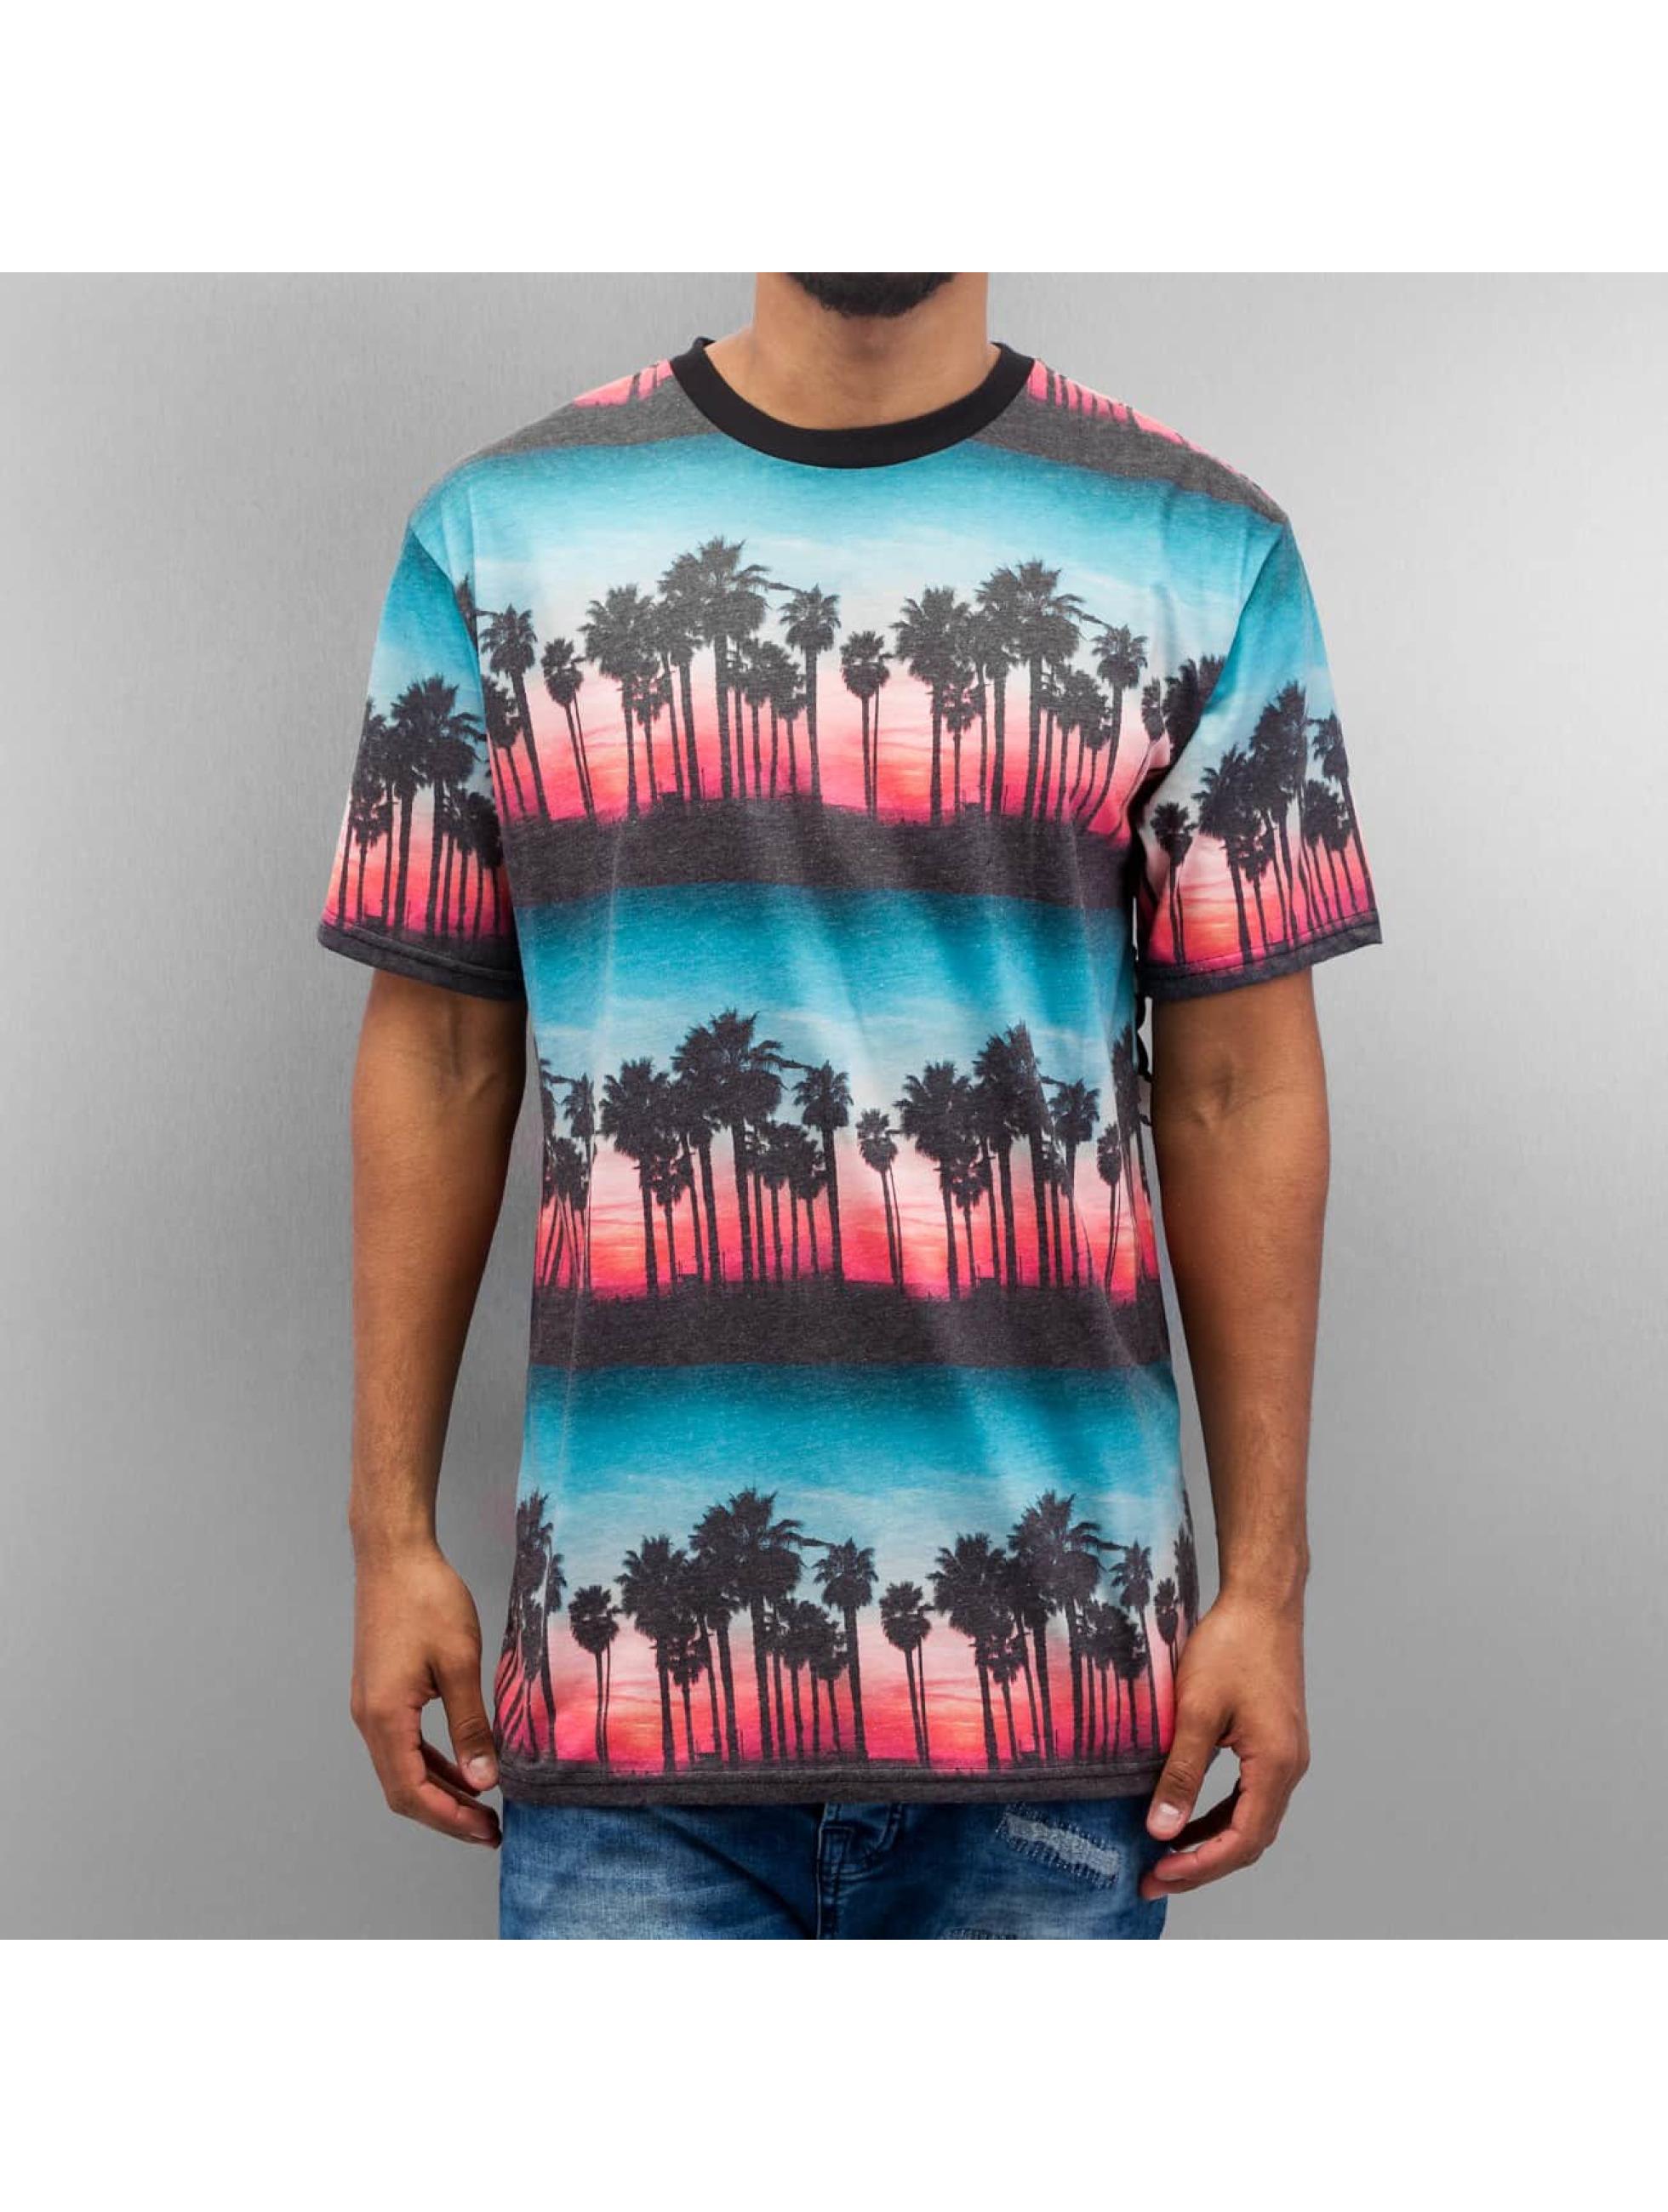 NEFF T-Shirt Sunset Dreams multicolore